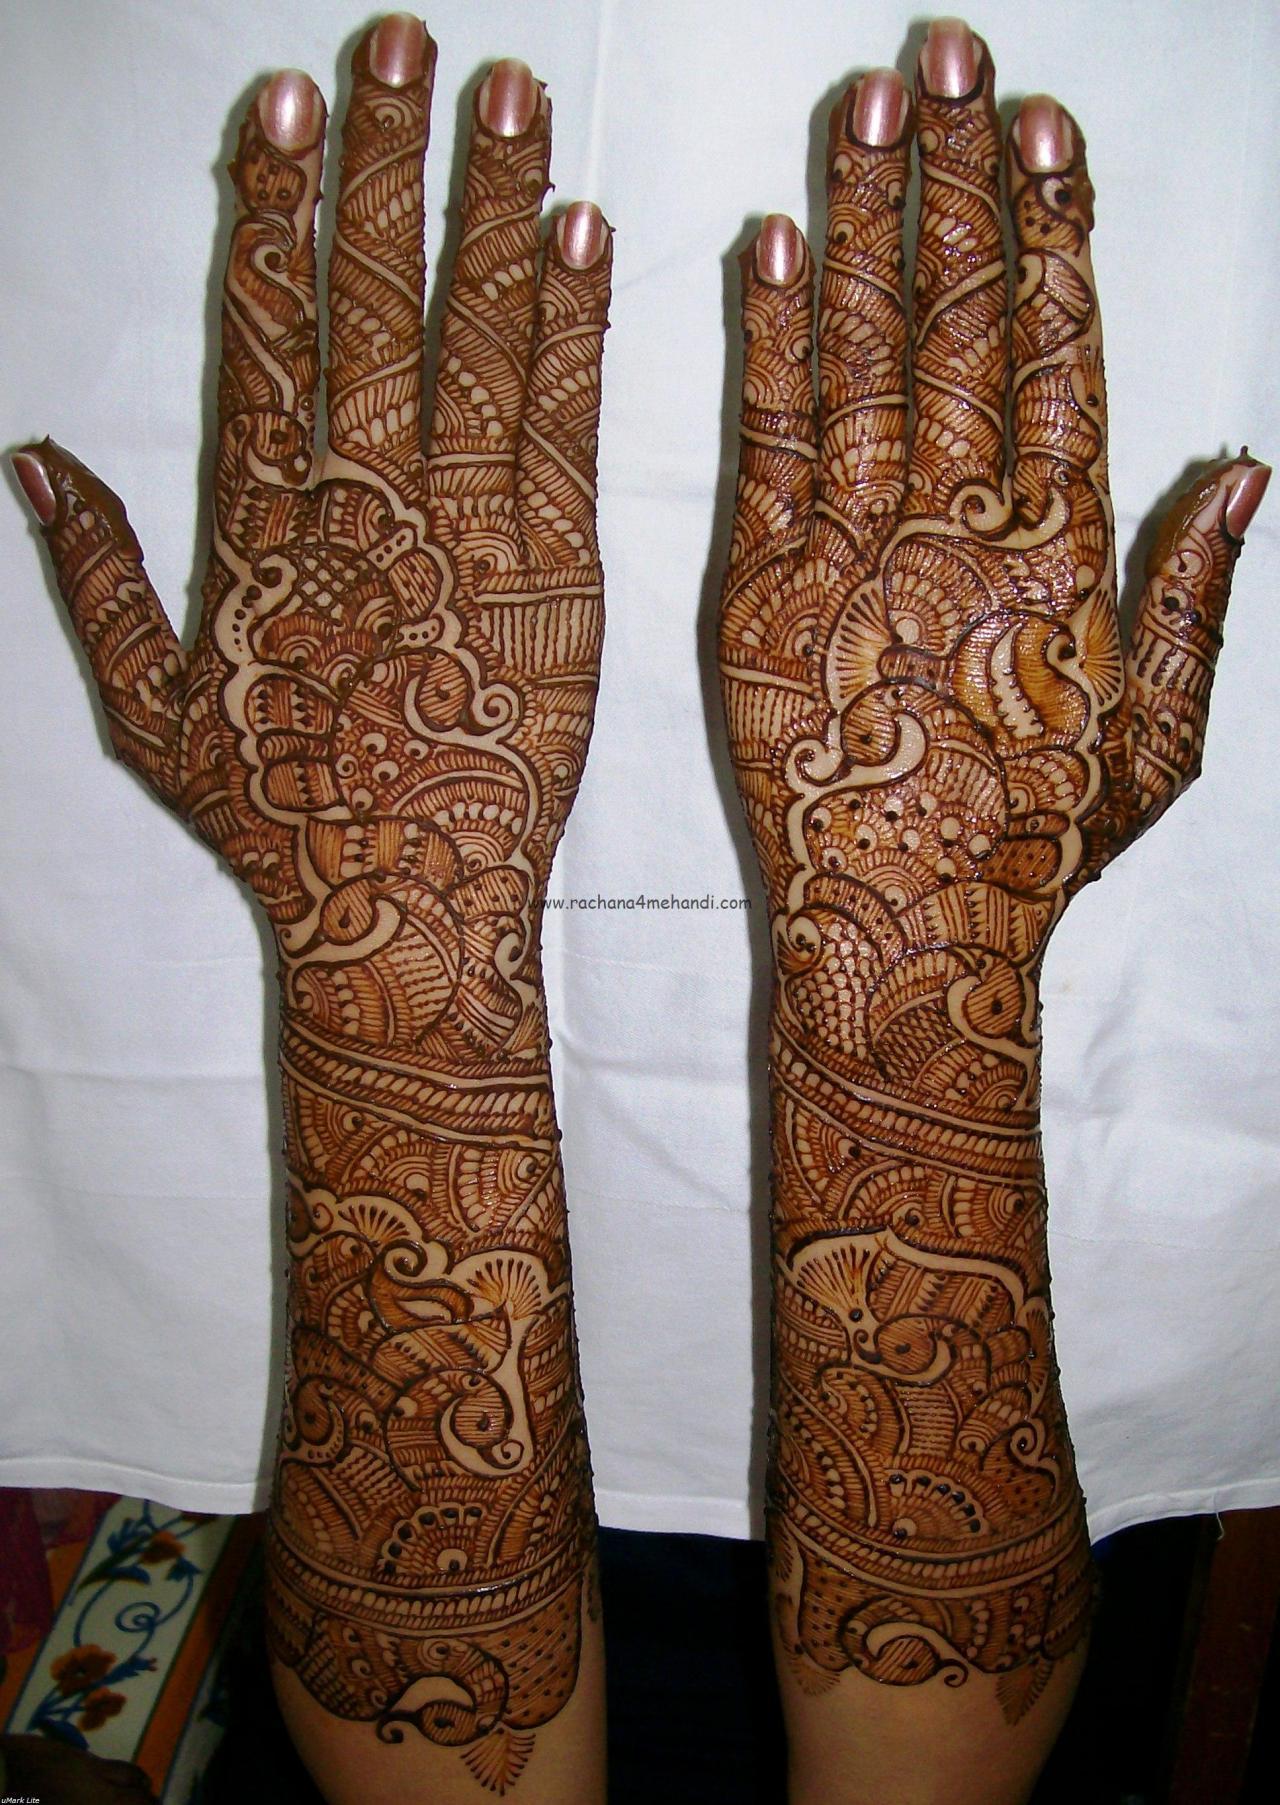 Bridal Mehndi Artist In Surat : Rachana mehndi artist bridal in mumbai